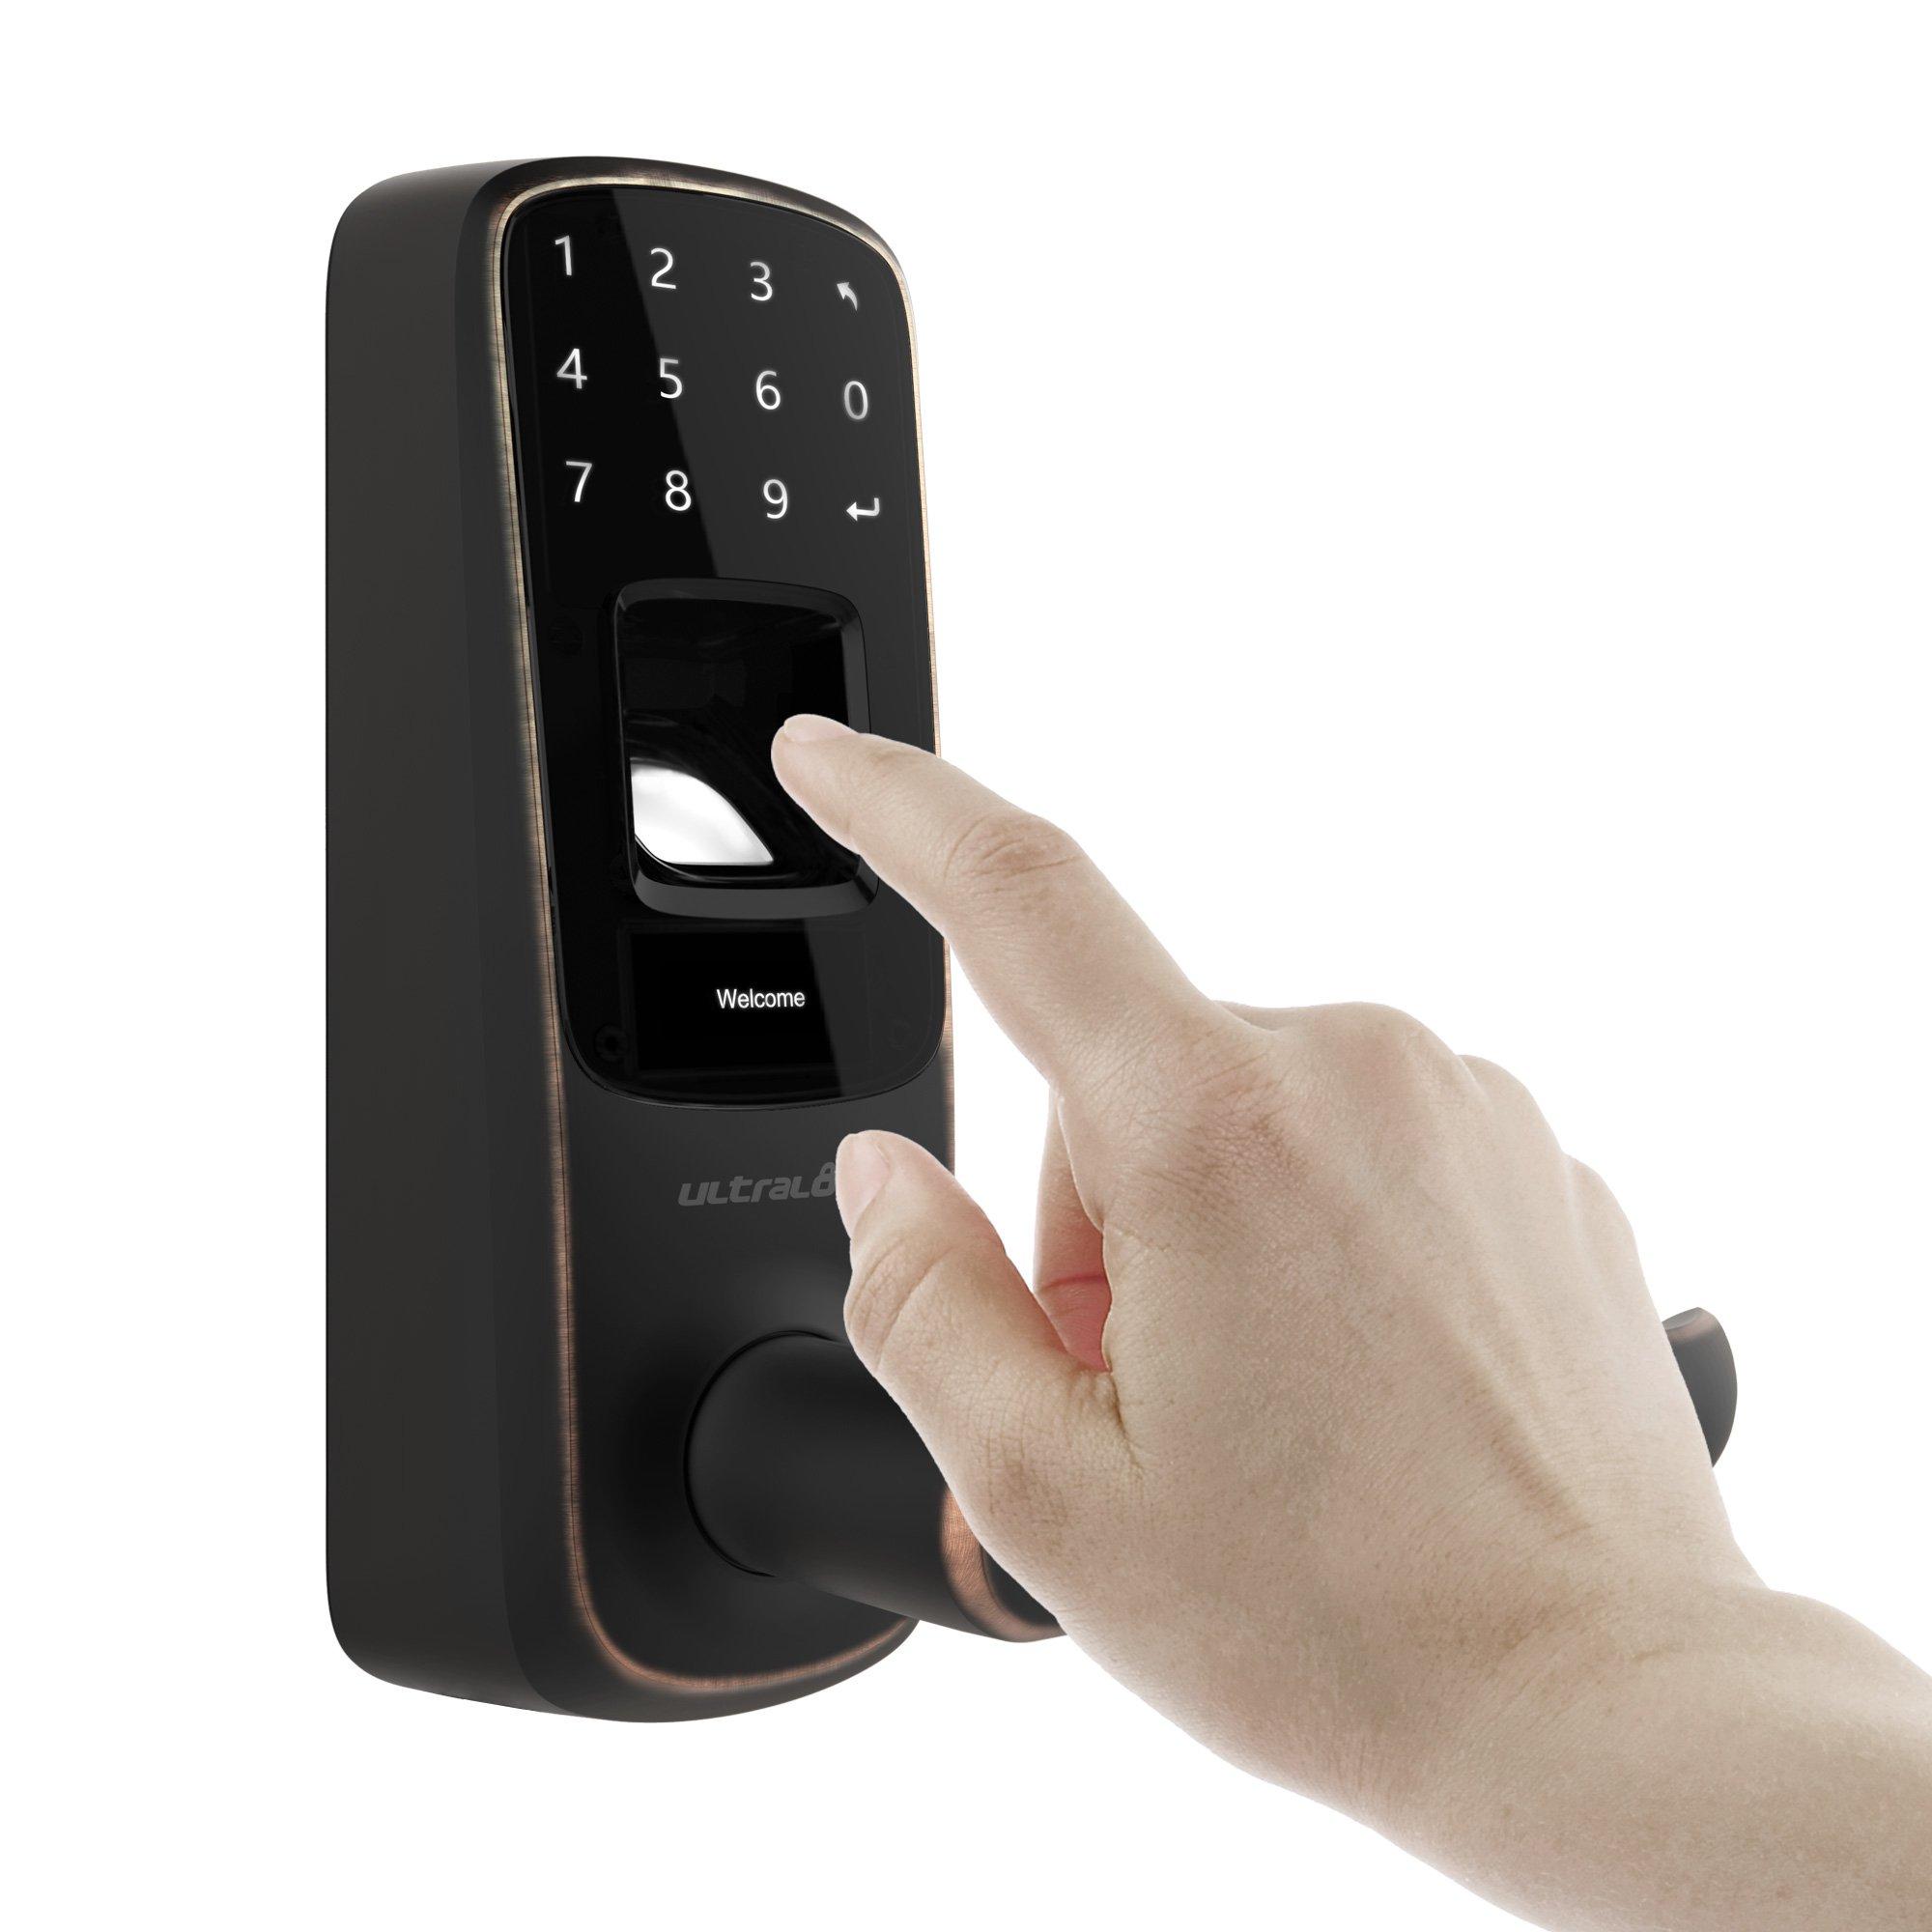 Ultraloq UL3 BT Bluetooth Enabled Fingerprint and Touchscreen Smart Lock (Aged Bronze) by Ultraloq (Image #4)